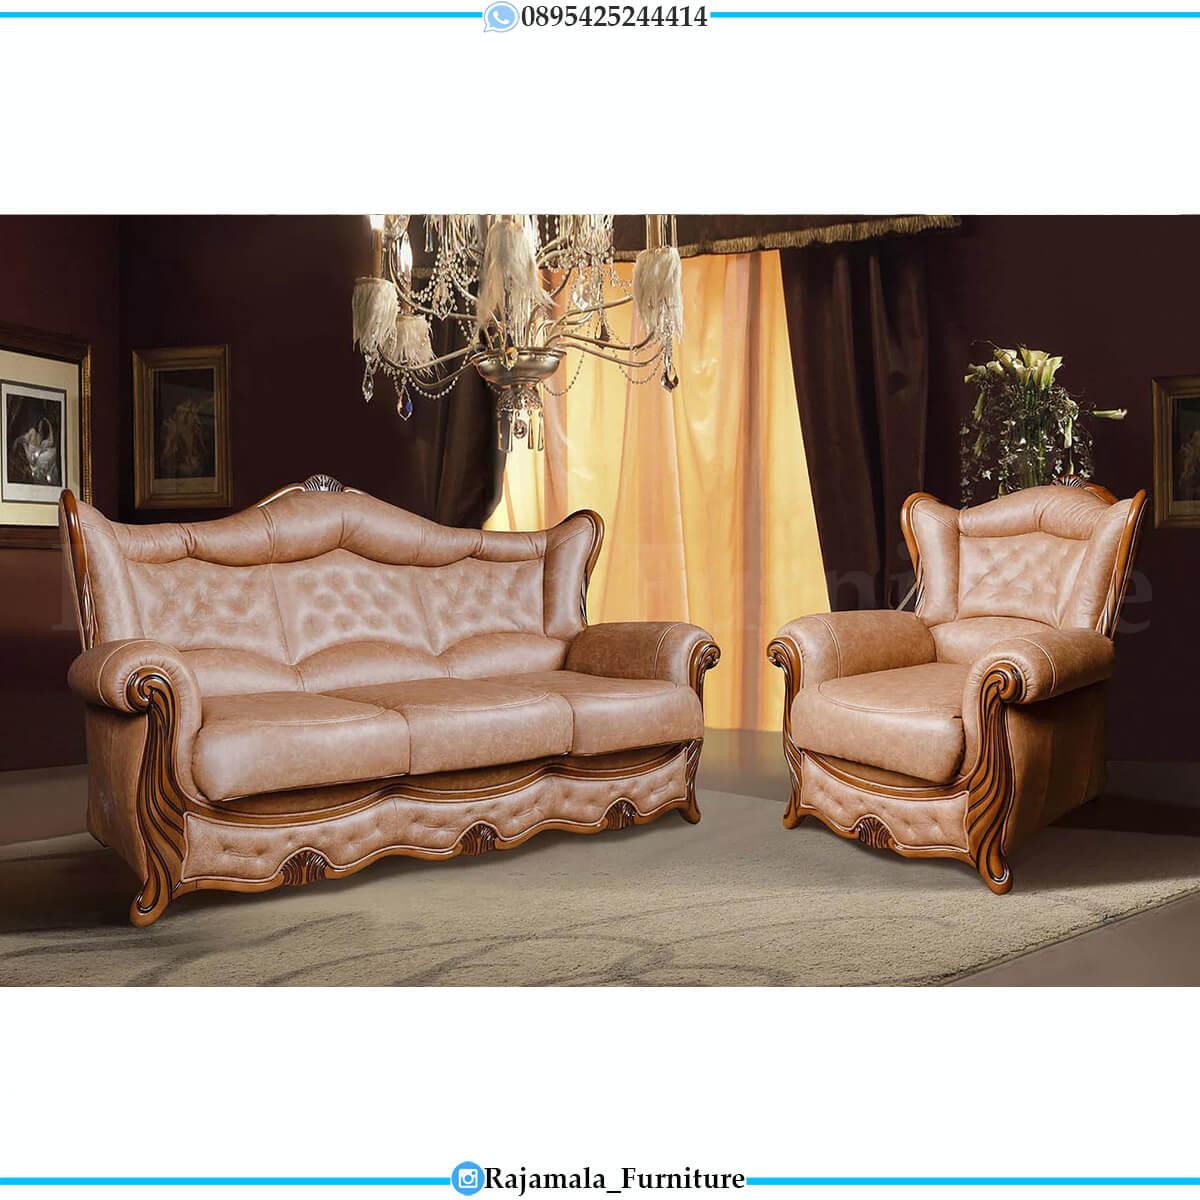 Sofa Tamu Mewah Terbaru Luxury Oscar Leather Great Quality RM-0751